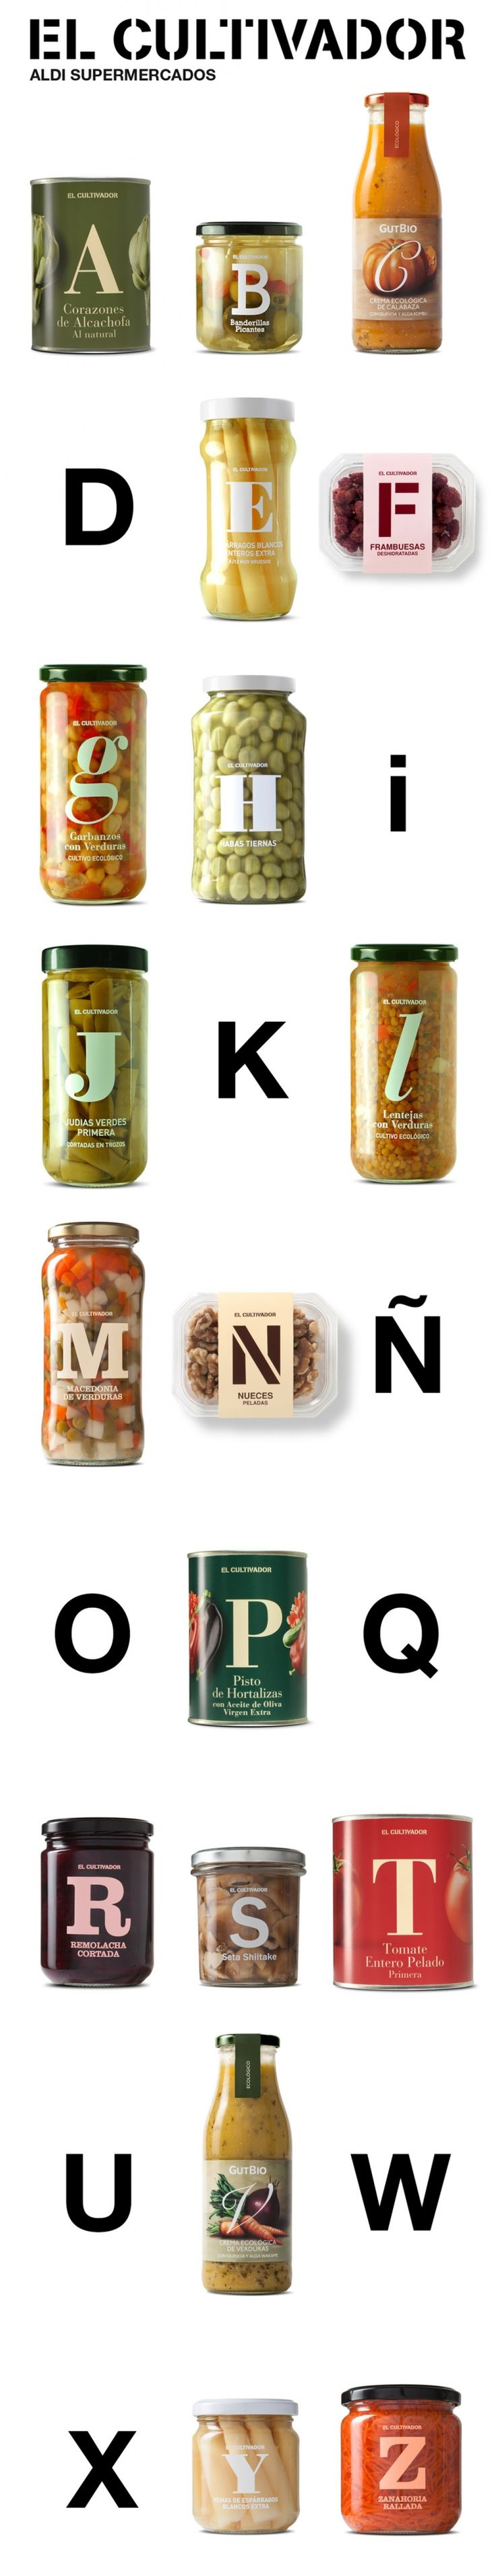 El Cultivador — The Dieline - Branding & Packaging Design